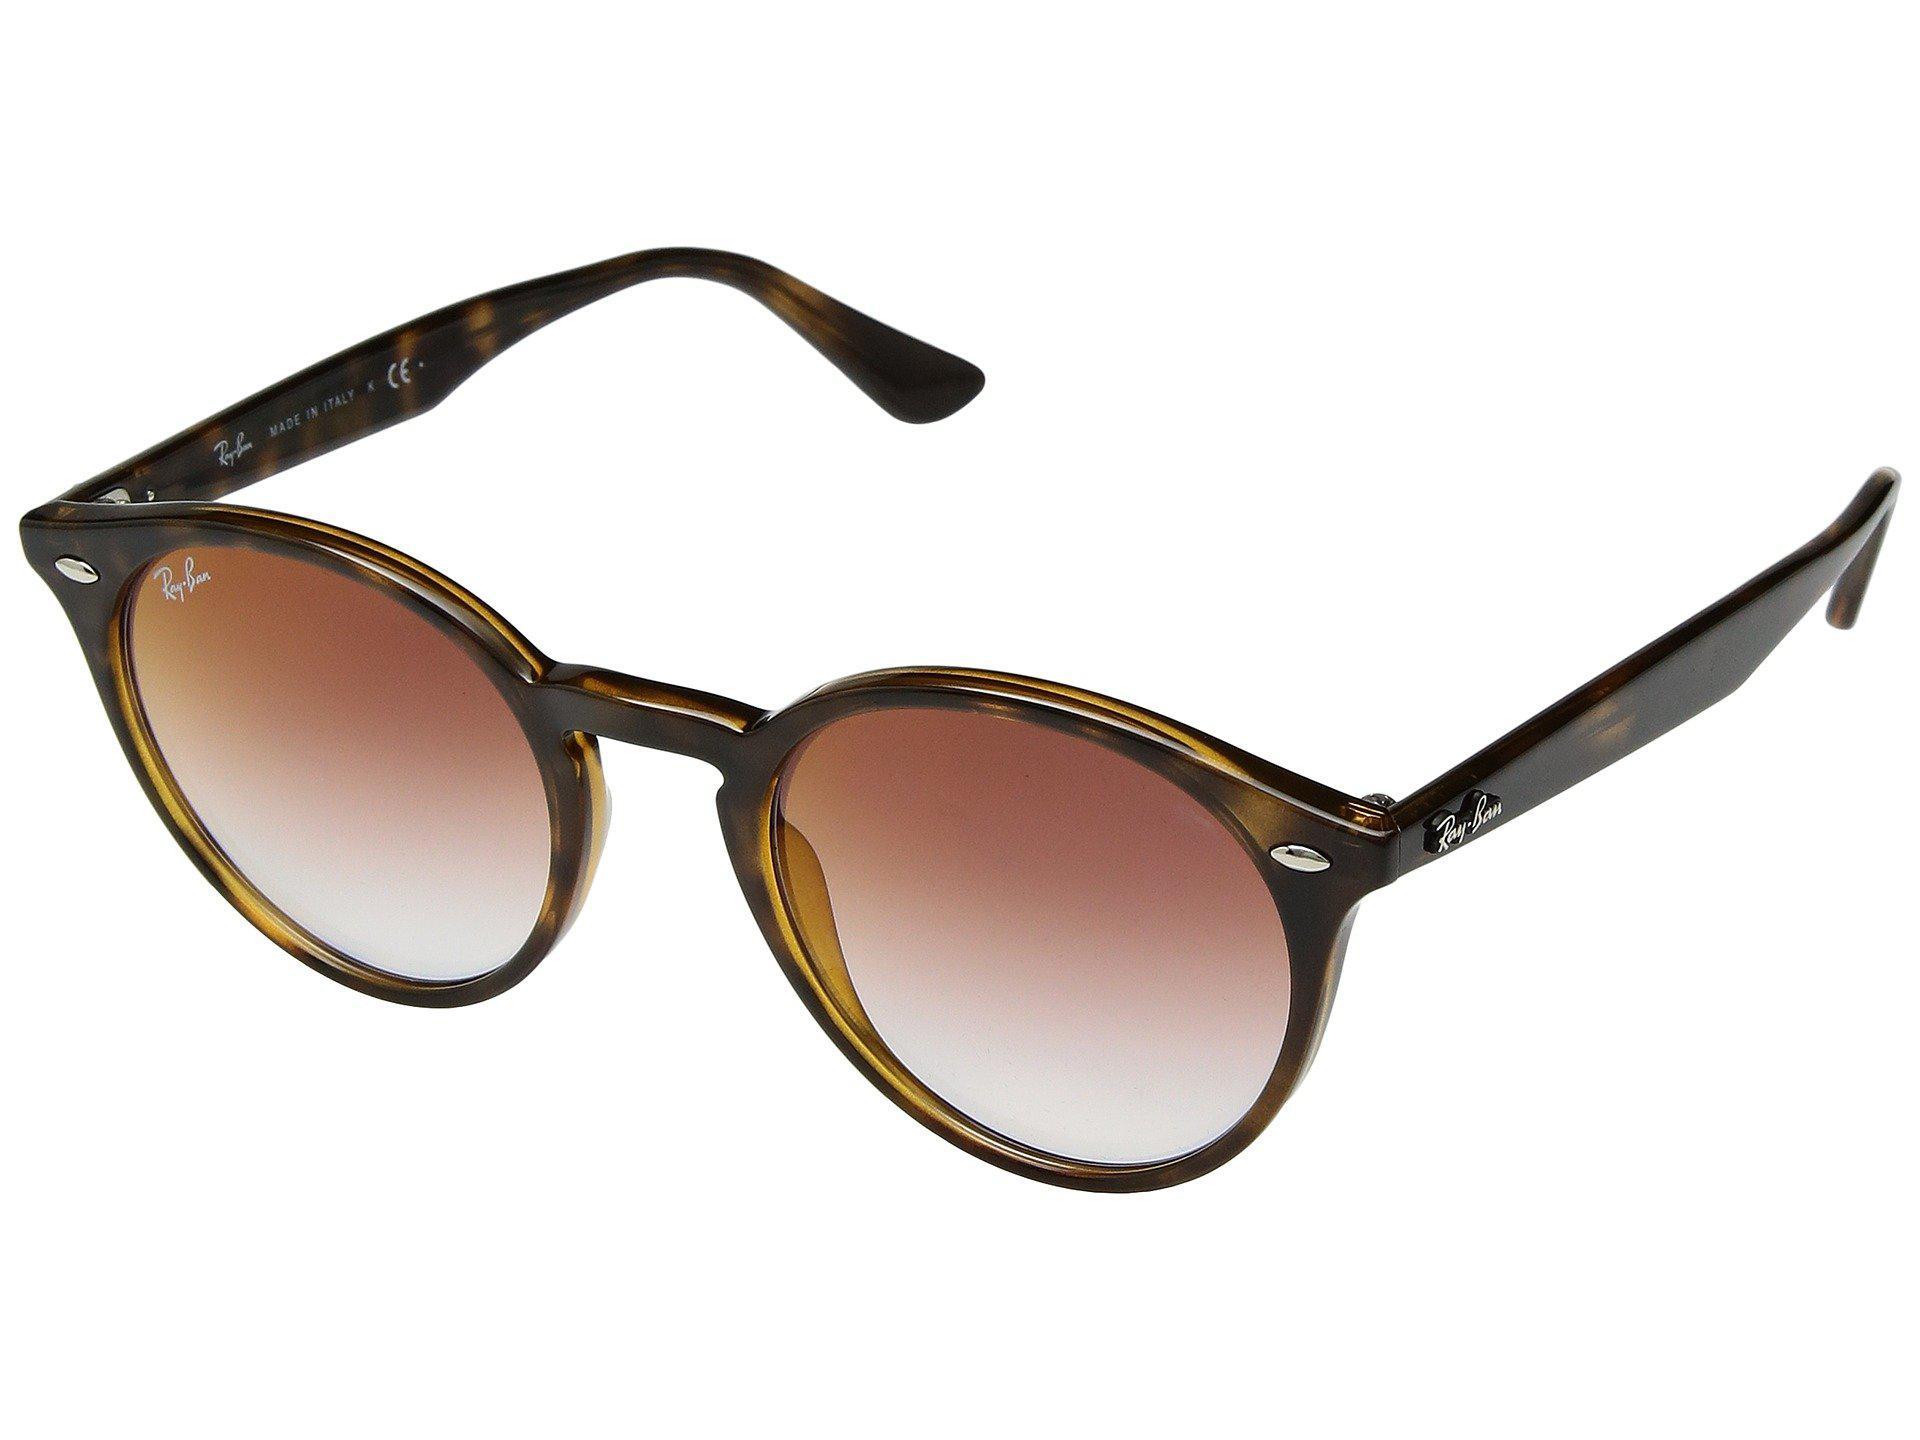 f81f9090e4 Ray-Ban. Women s Rb2180 51mm (havana light Red Gradient Mirror) Fashion  Sunglasses